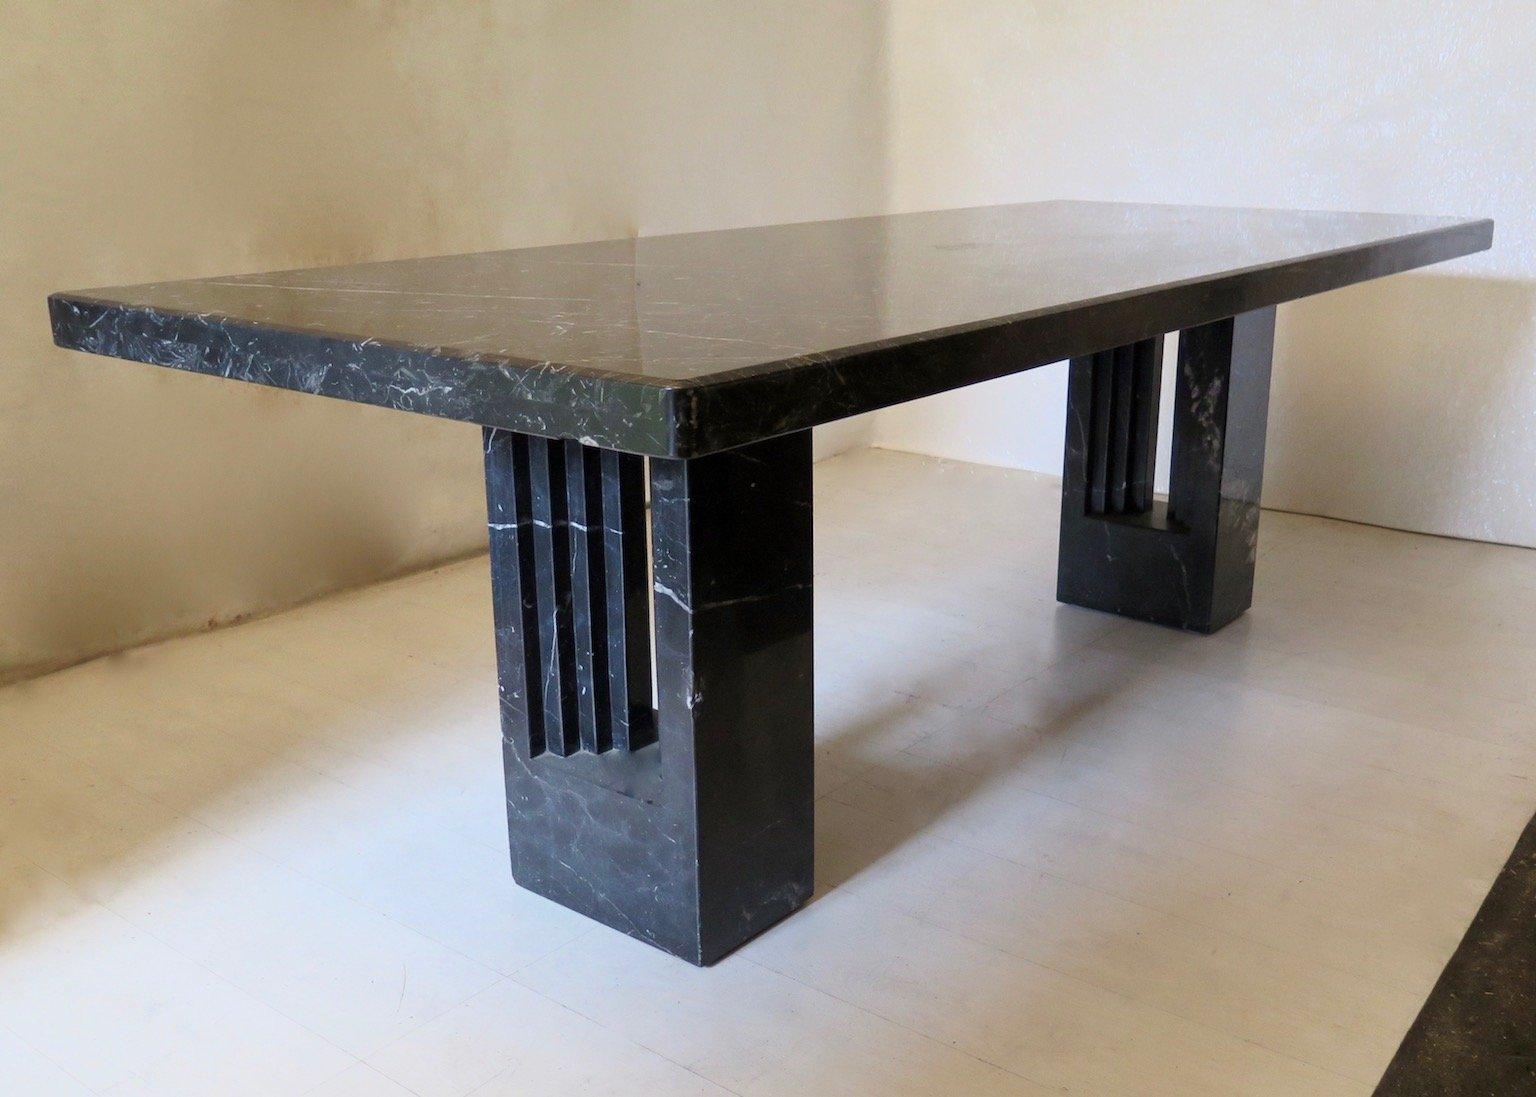 delfi marmor tisch von marcel breuer carlo scarpa 1969. Black Bedroom Furniture Sets. Home Design Ideas